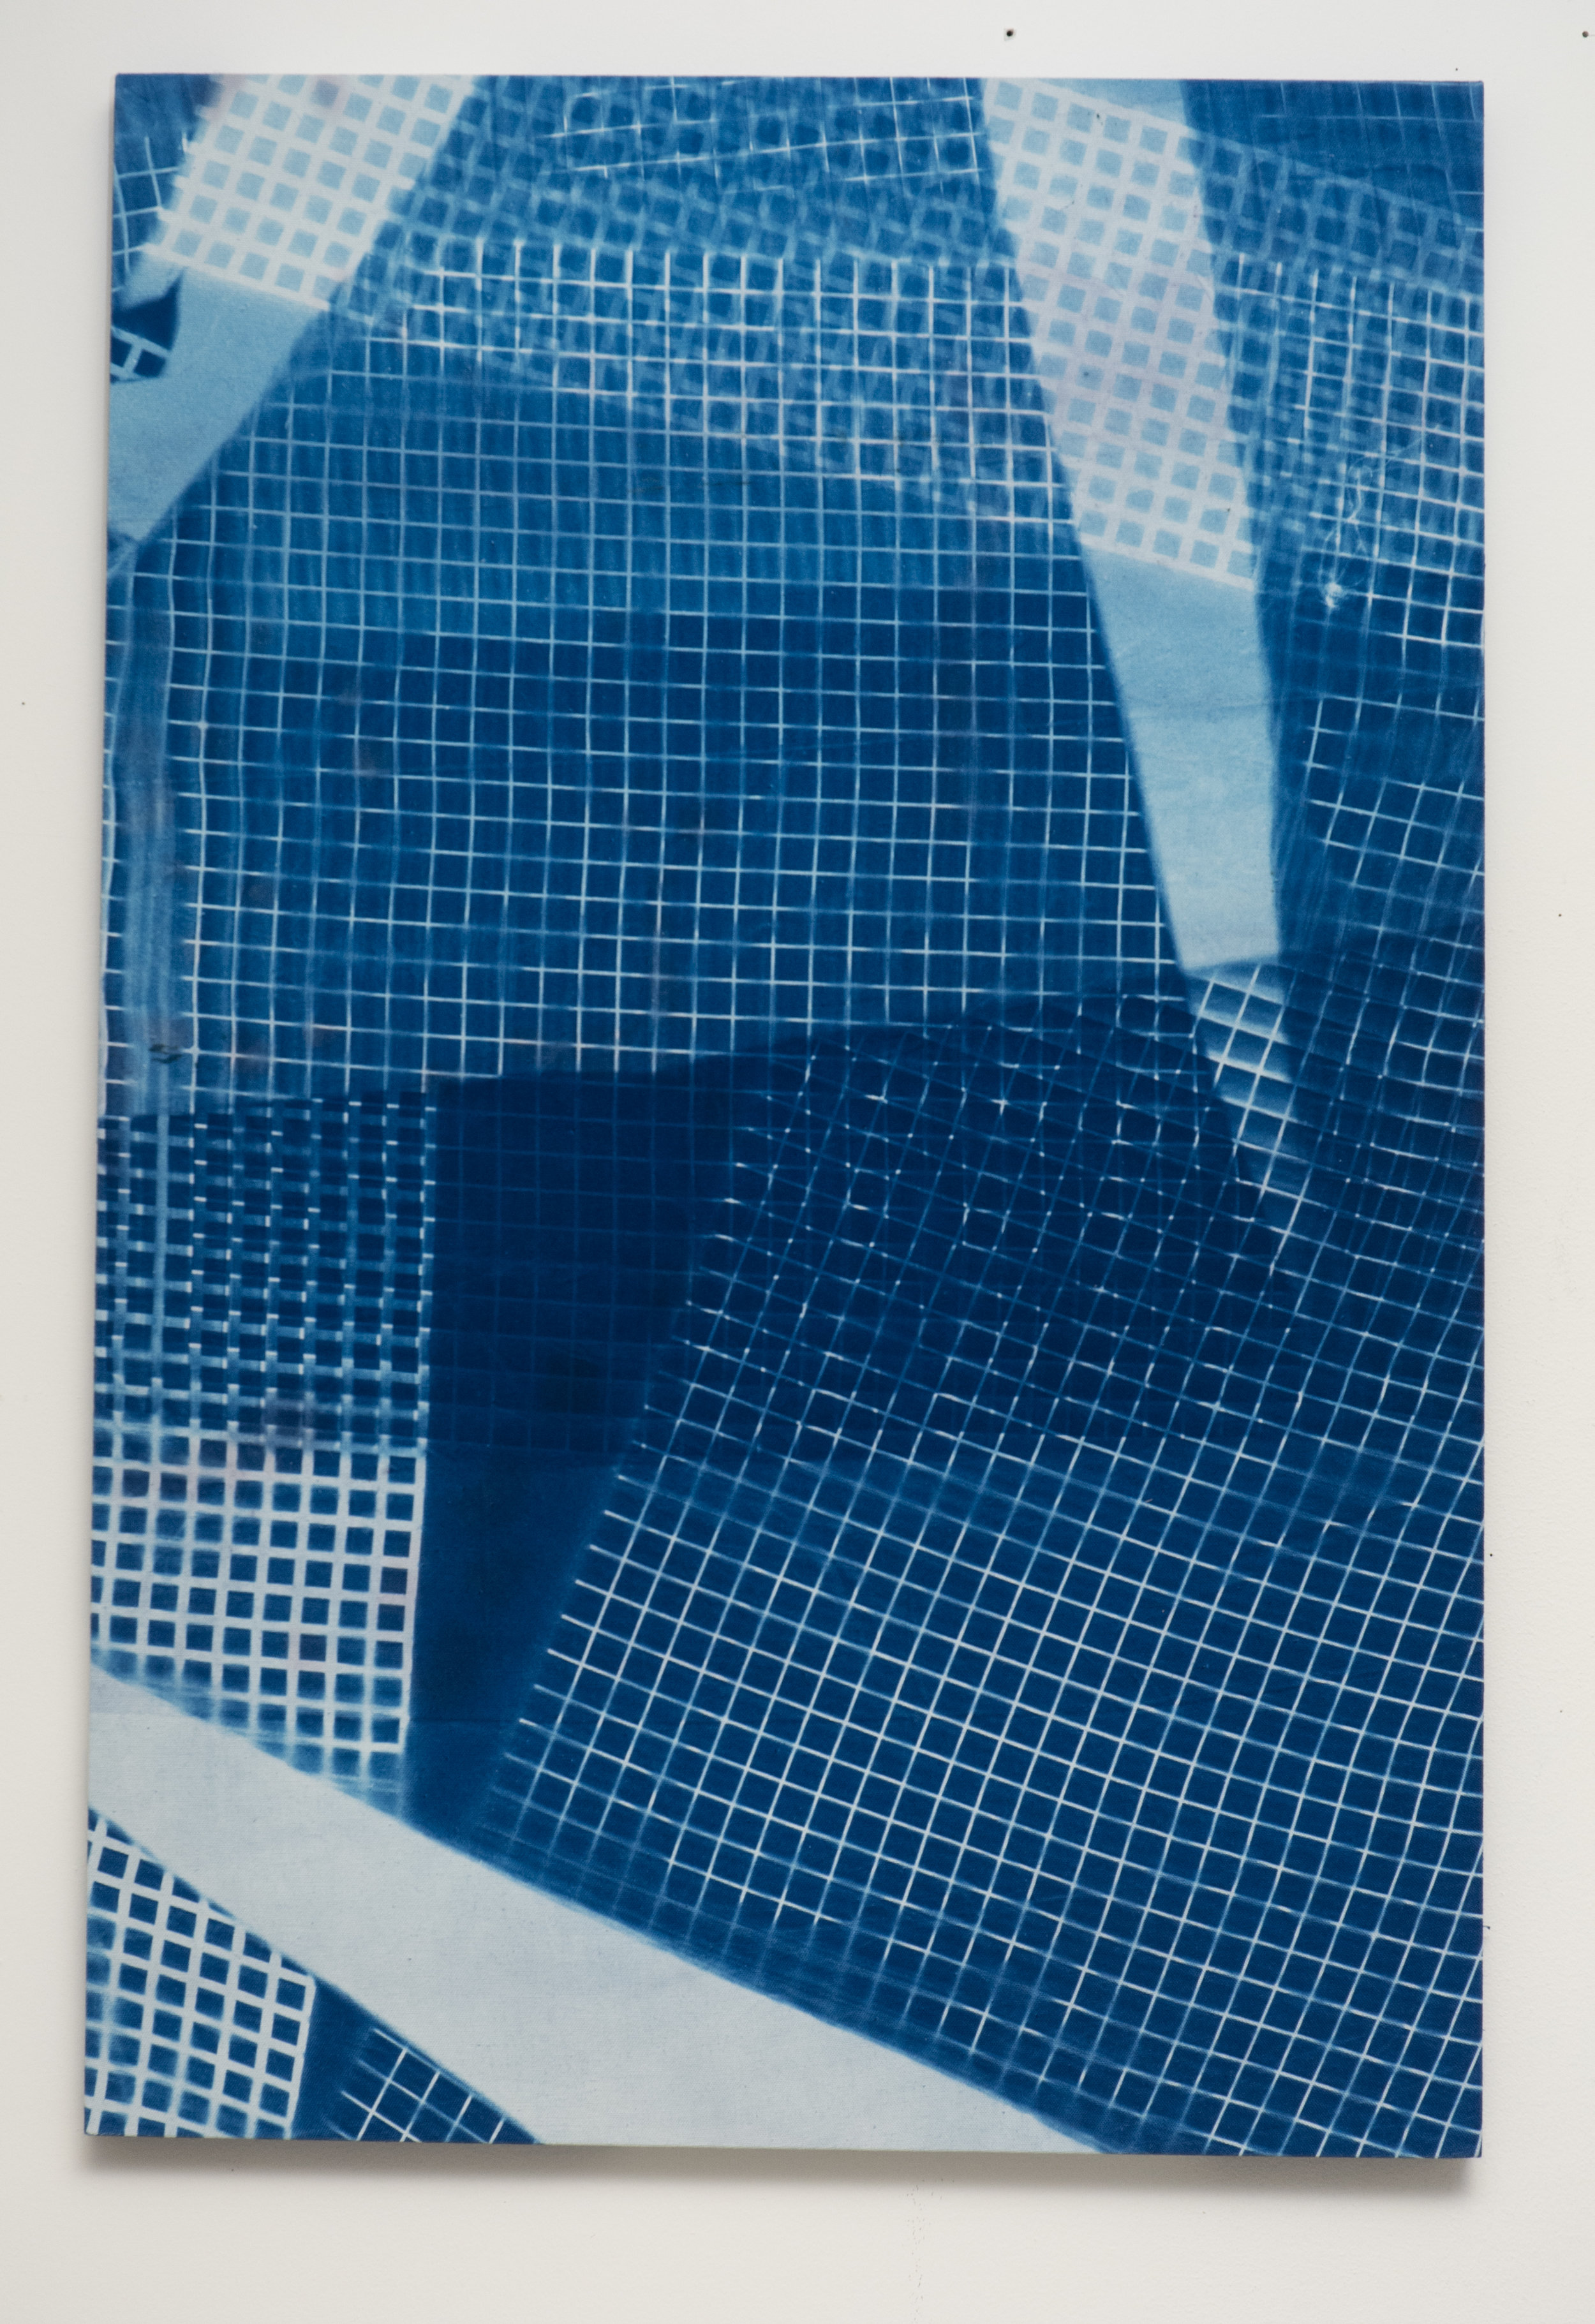 4Cyanotypes_White Fluorescent Light Diffuser Double Variant 3_224x36%22-.jpg